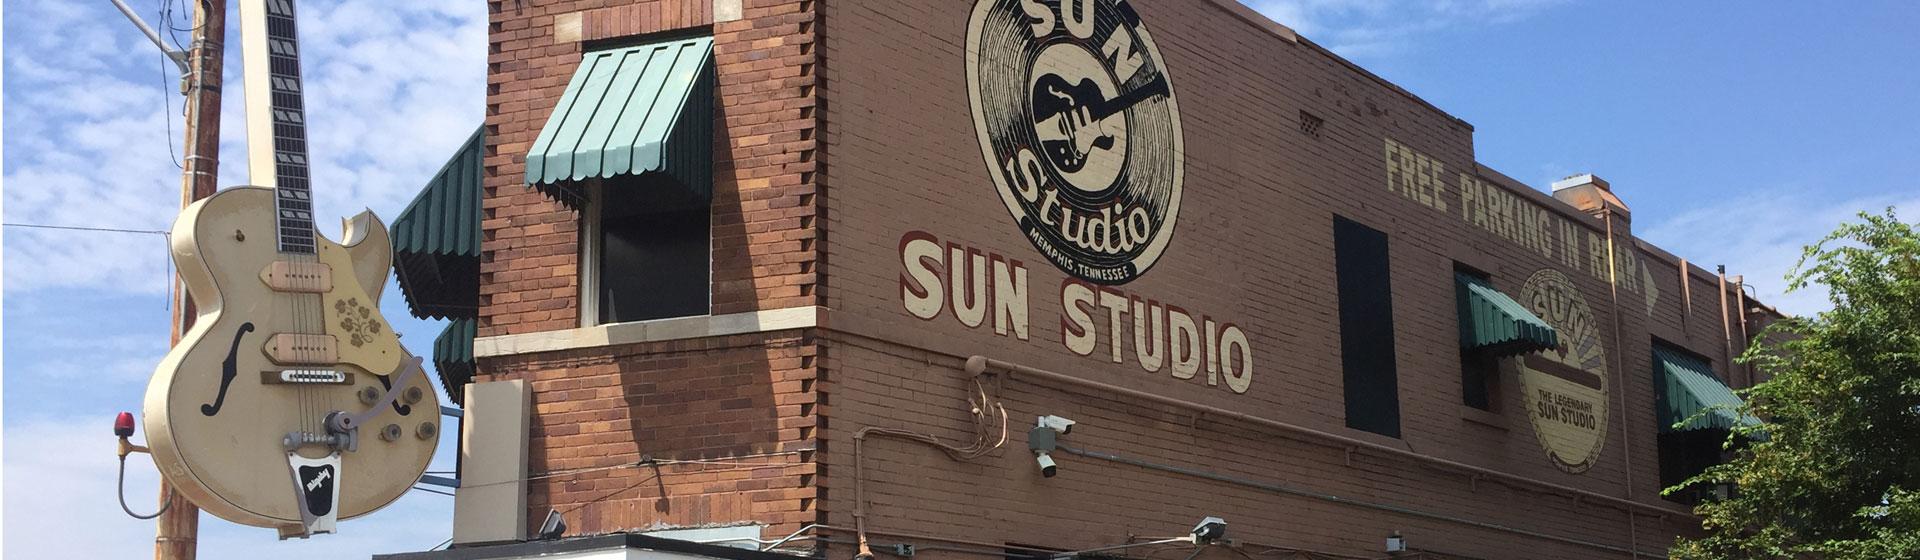 Sun Studio i Memphis